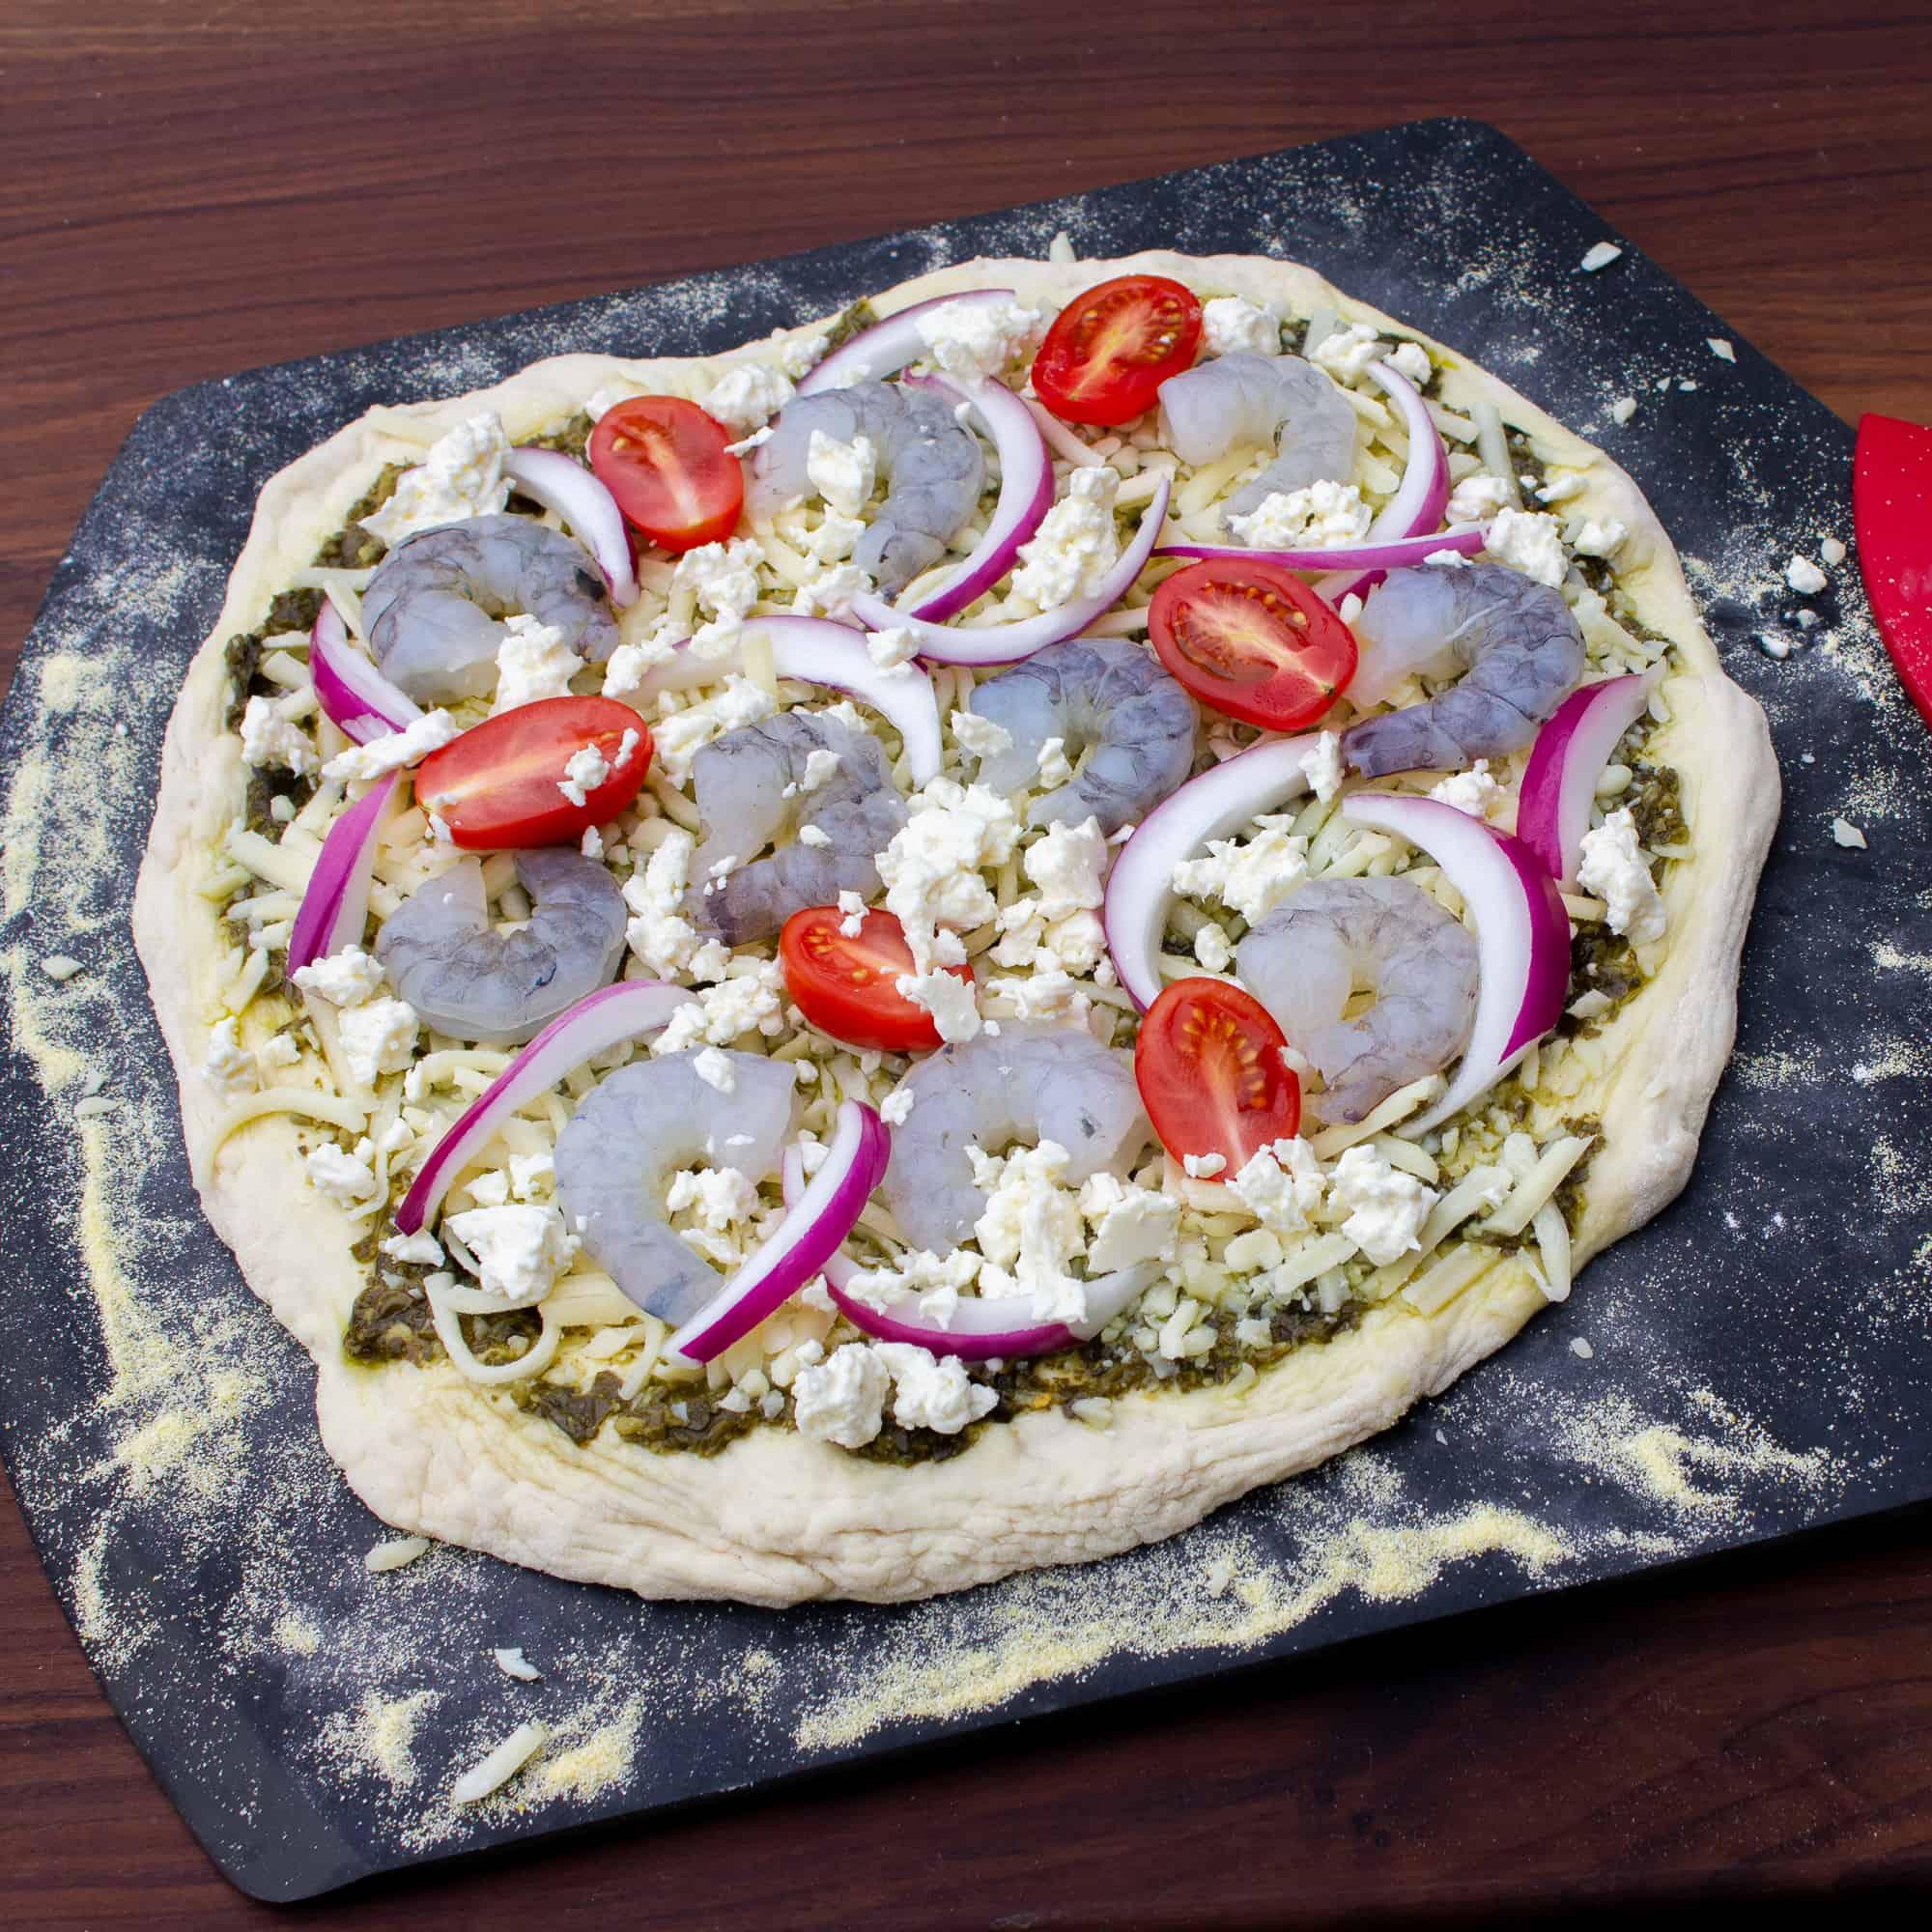 Ingredients for a mediterranean pizza